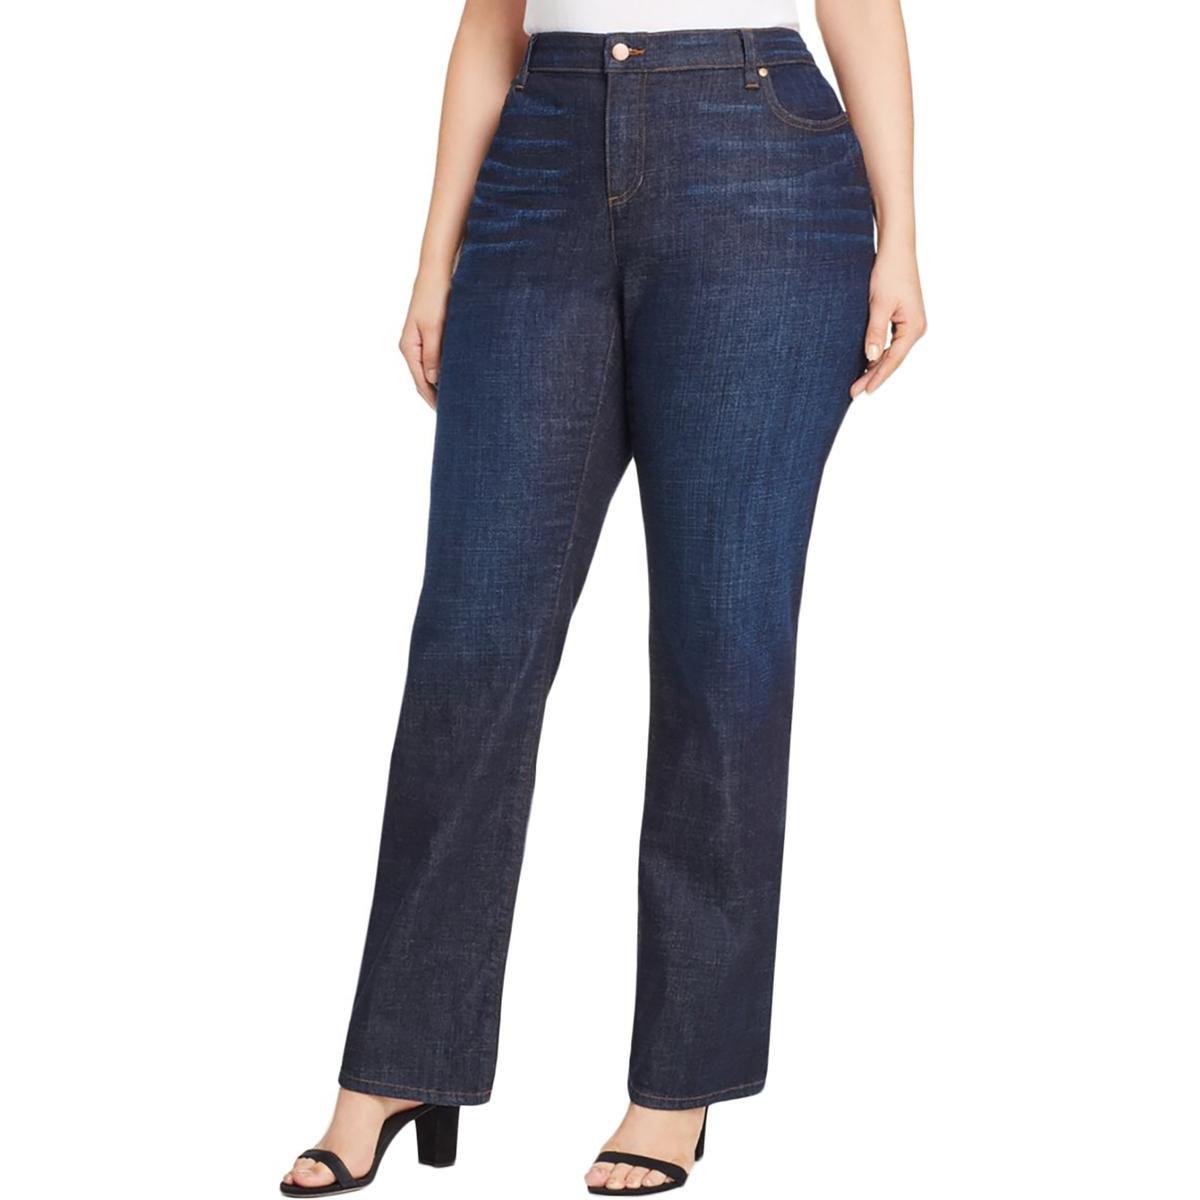 Eileen Fisher Womens Plus Bootcut Dark Wash Jeans Blue 20W